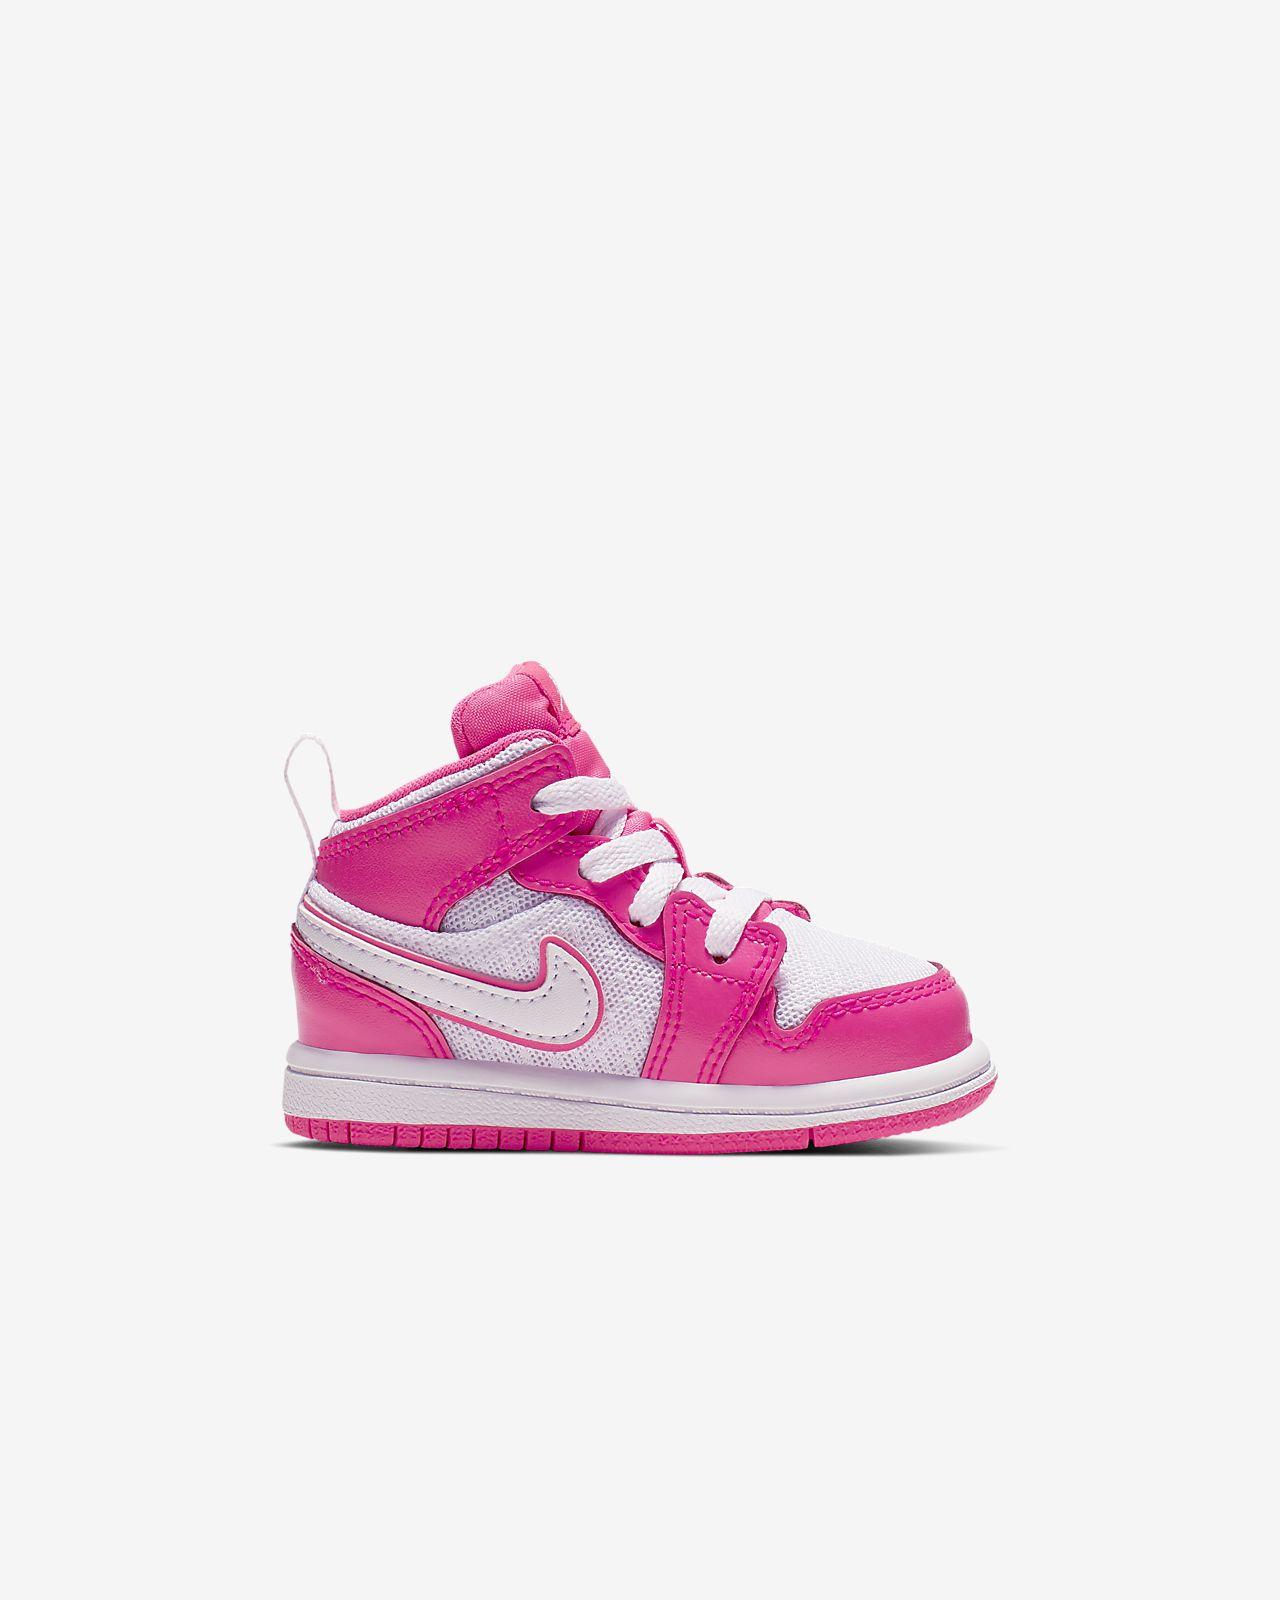 brand new 6e1a4 f62fc ... Air Jordan 1 Mid GT Infant Toddler Shoe